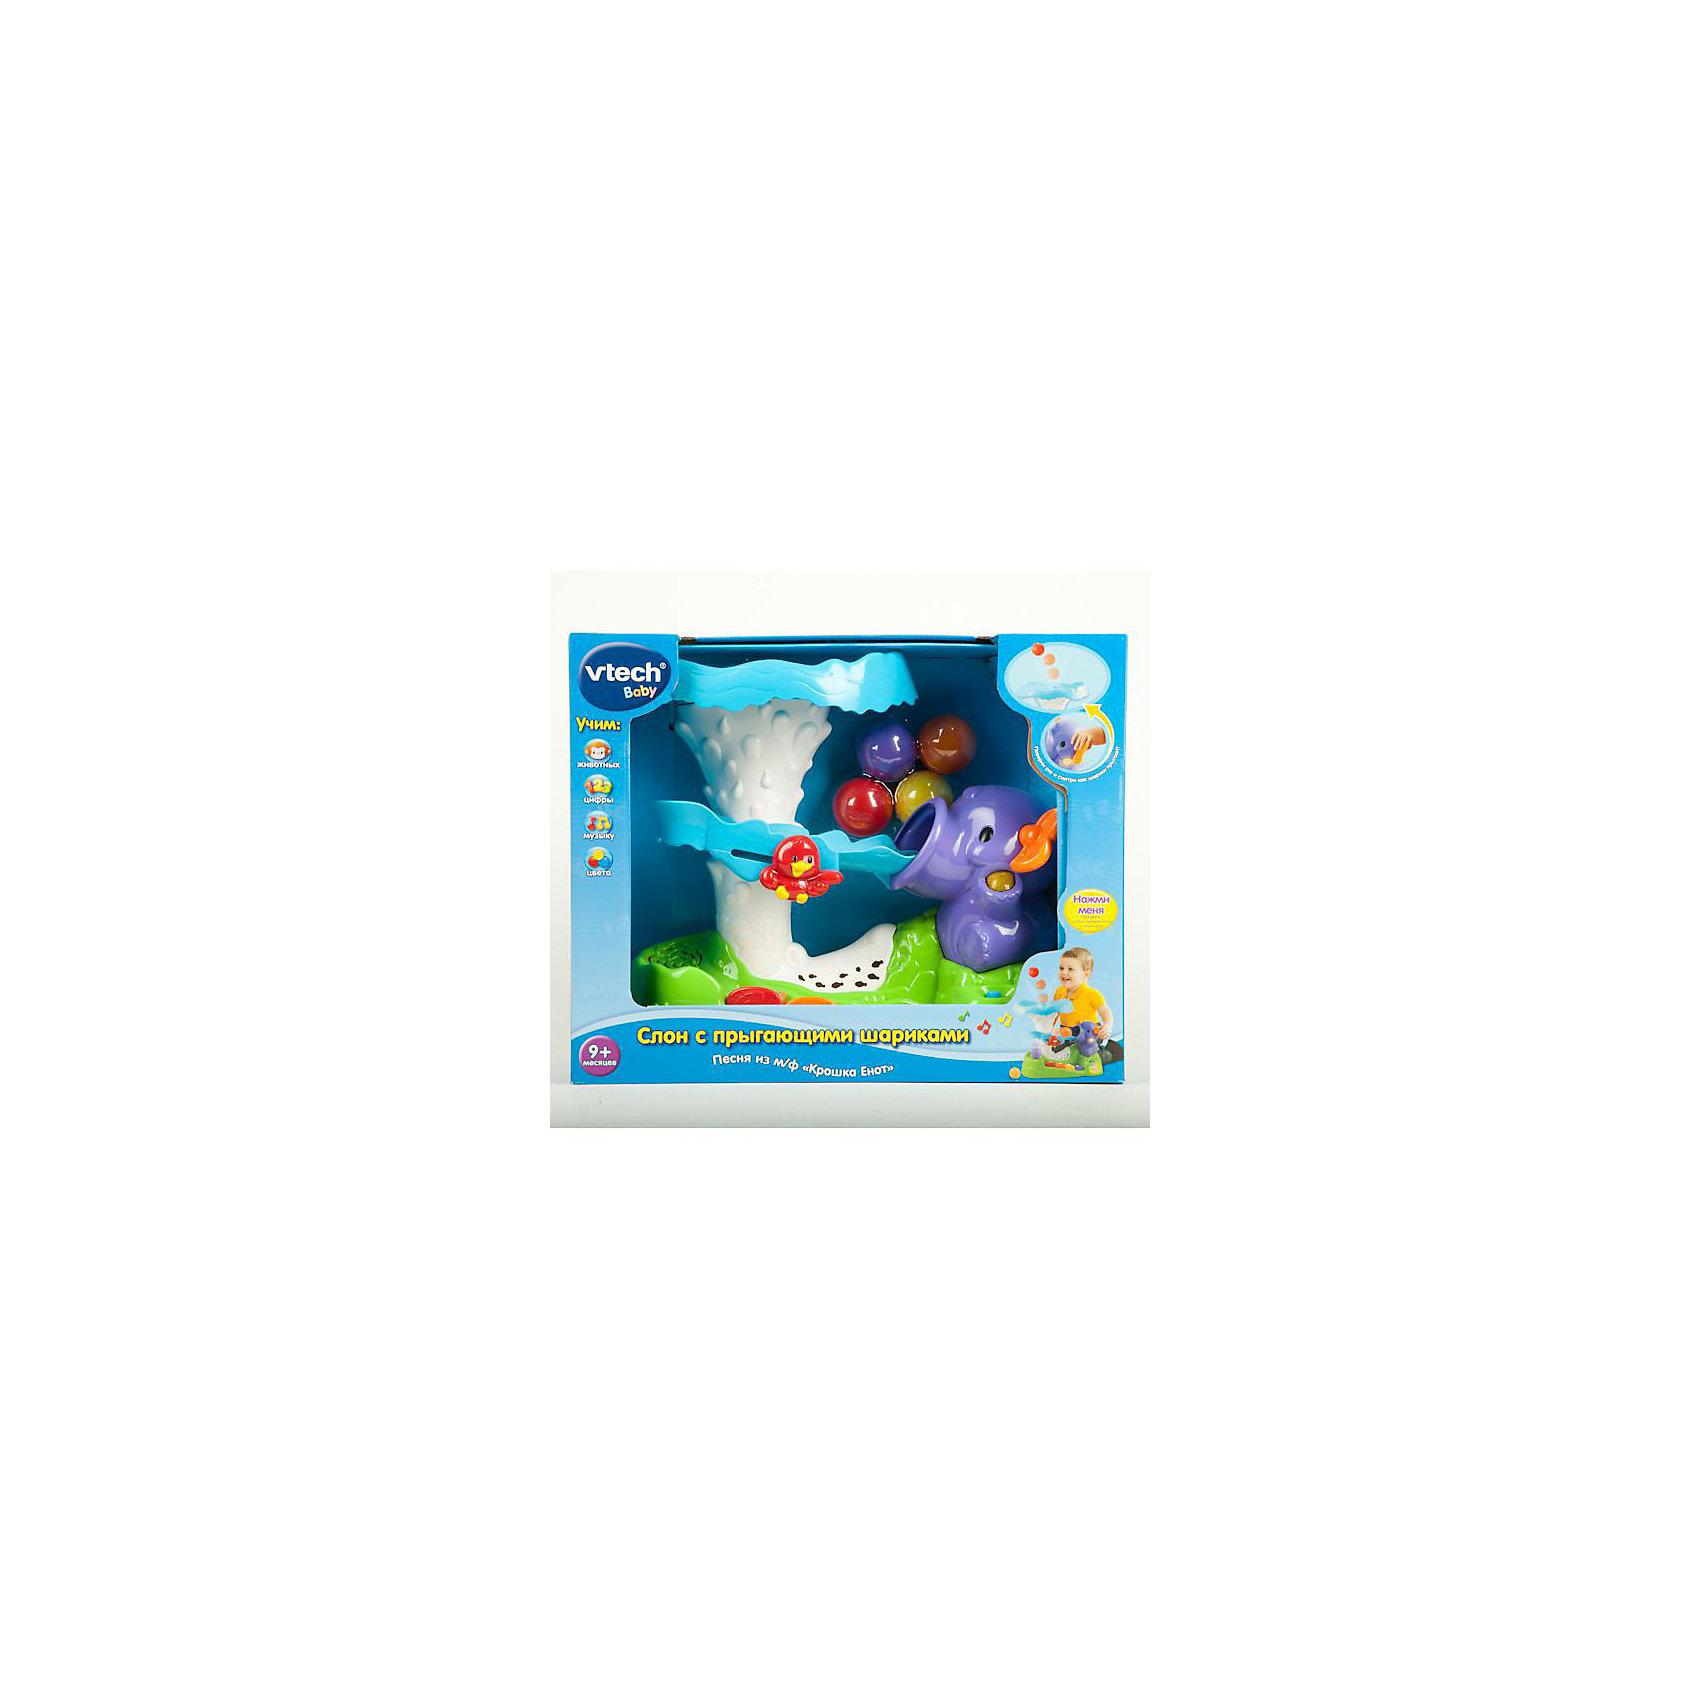 Vtech Обучающий слон с шариками, со звуком и светом, Vtech ноутбук hp zbook 17 g4 y6k38ea xeon e3 1535m 32gb 512gb ssd nv p4000m 8gb 17 3 fullhd win10pro